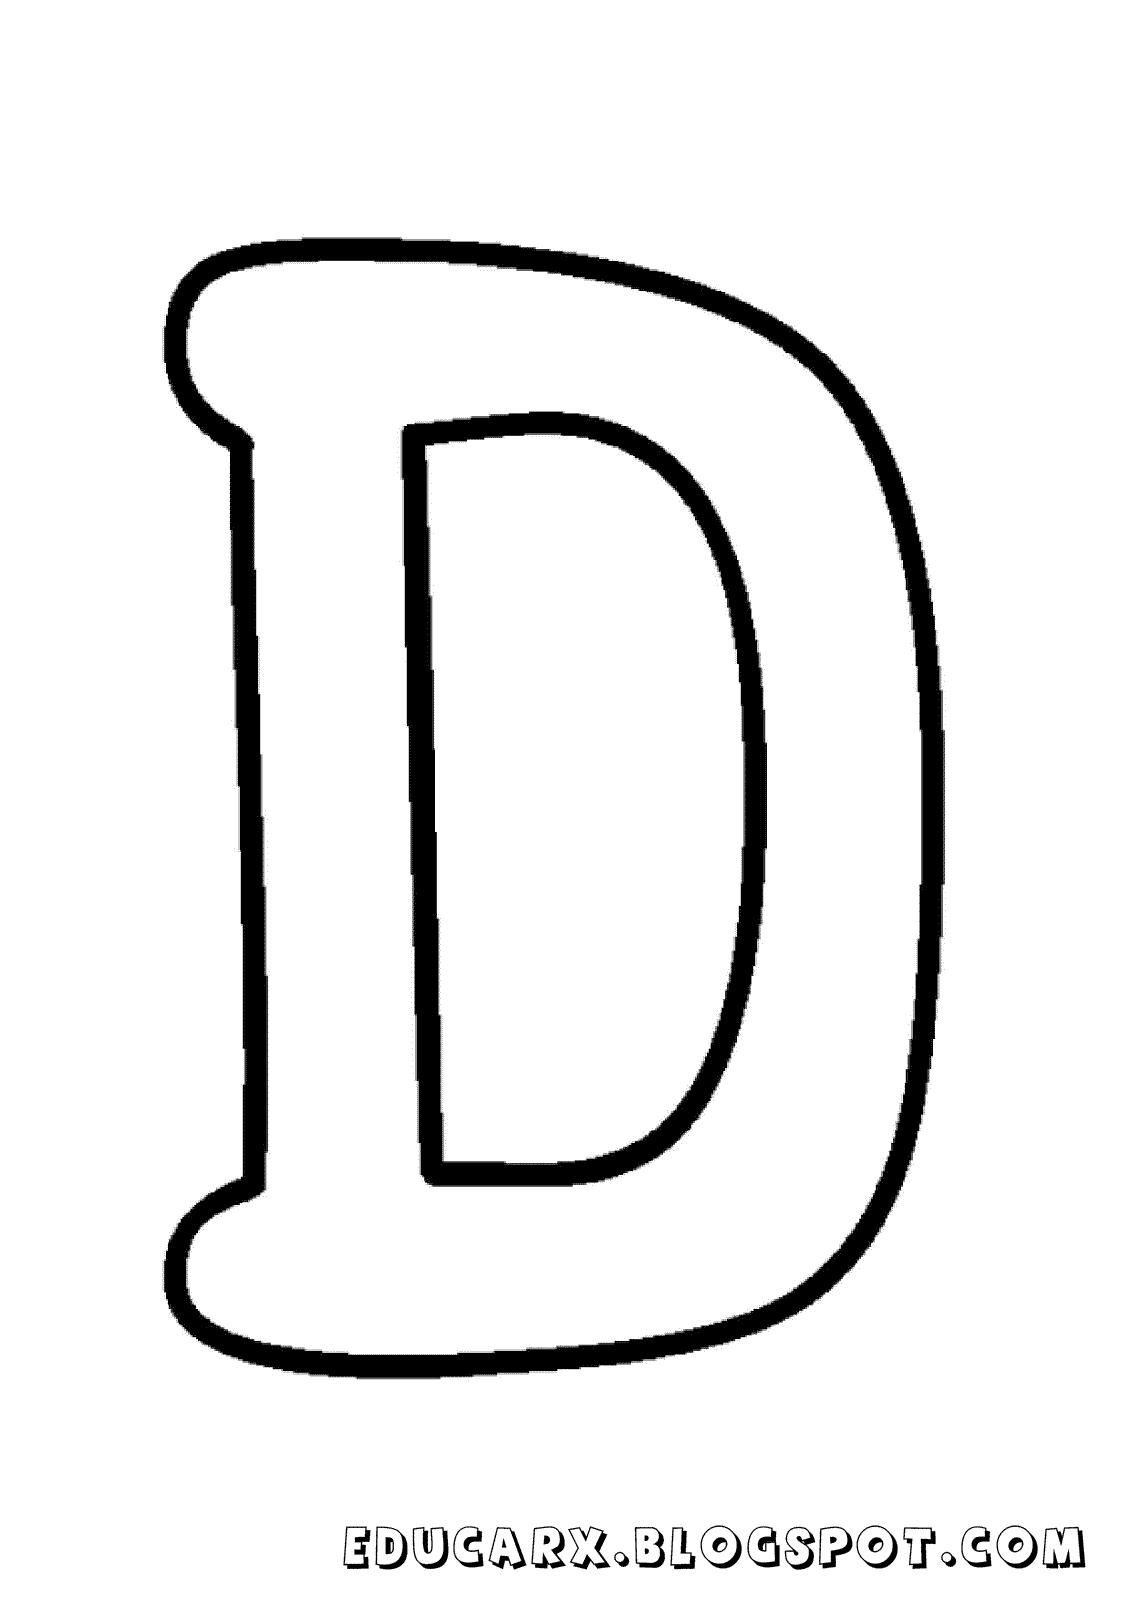 Molde da letra maiúscula D